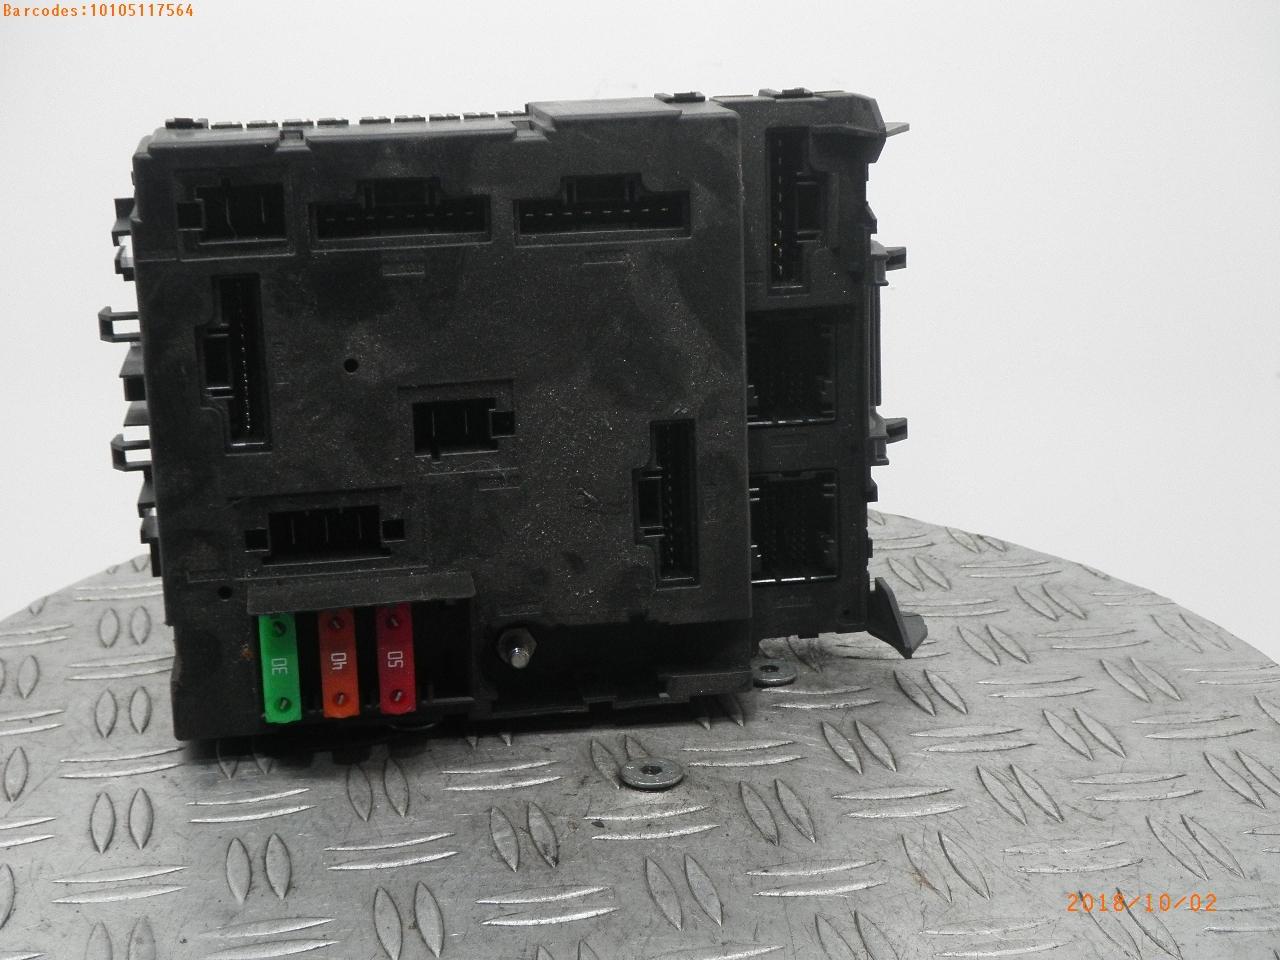 hight resolution of fuse box a4519007800 001 smart zentralelektrik smart fortwo coupe 451